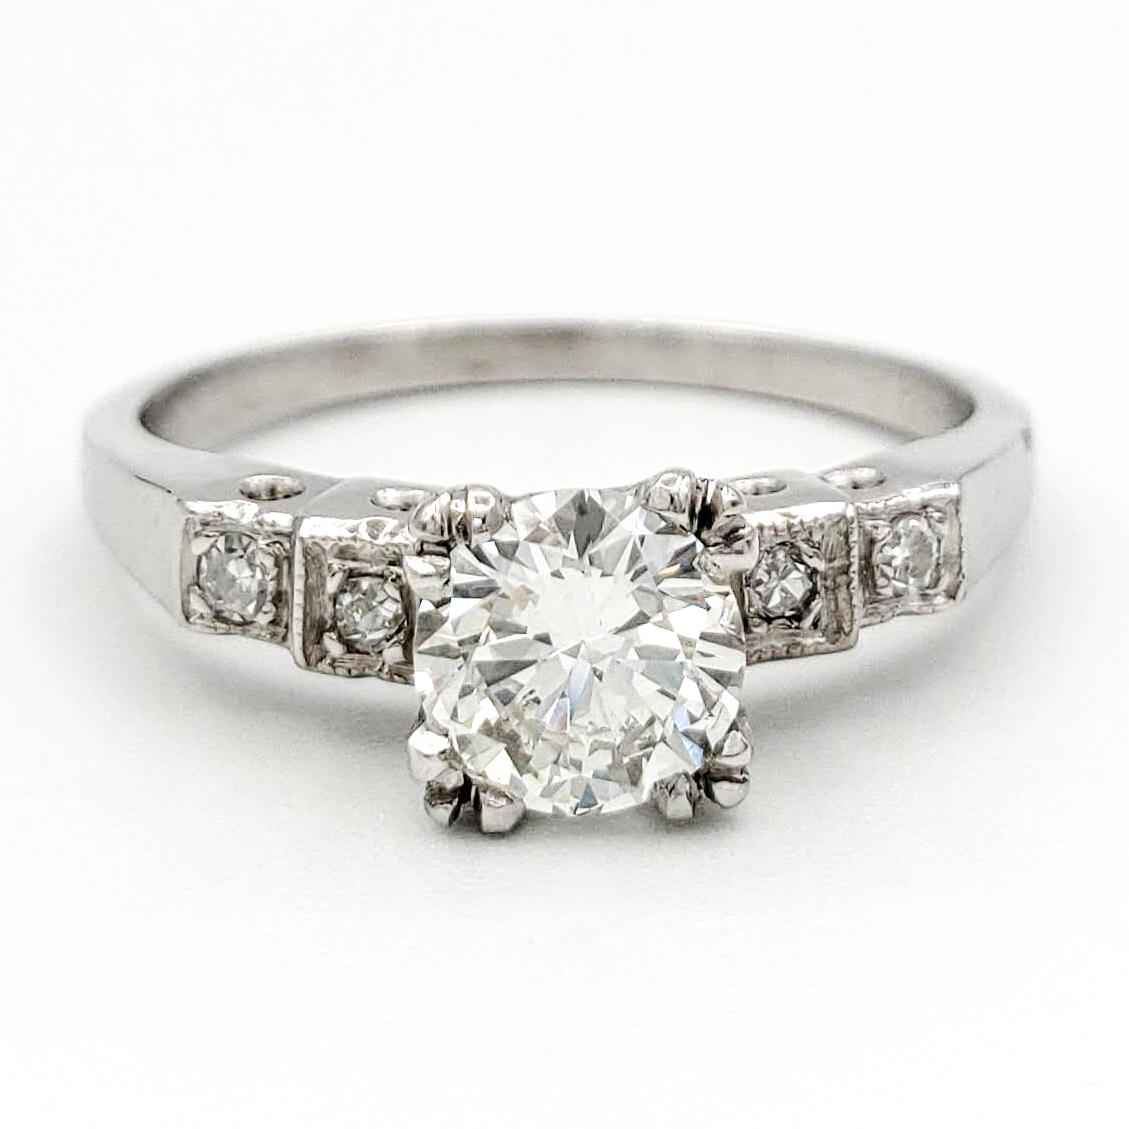 vintage-platinum-engagement-ring-with-0-66-carat-round-brilliant-cut-diamond-egl-g-vs1